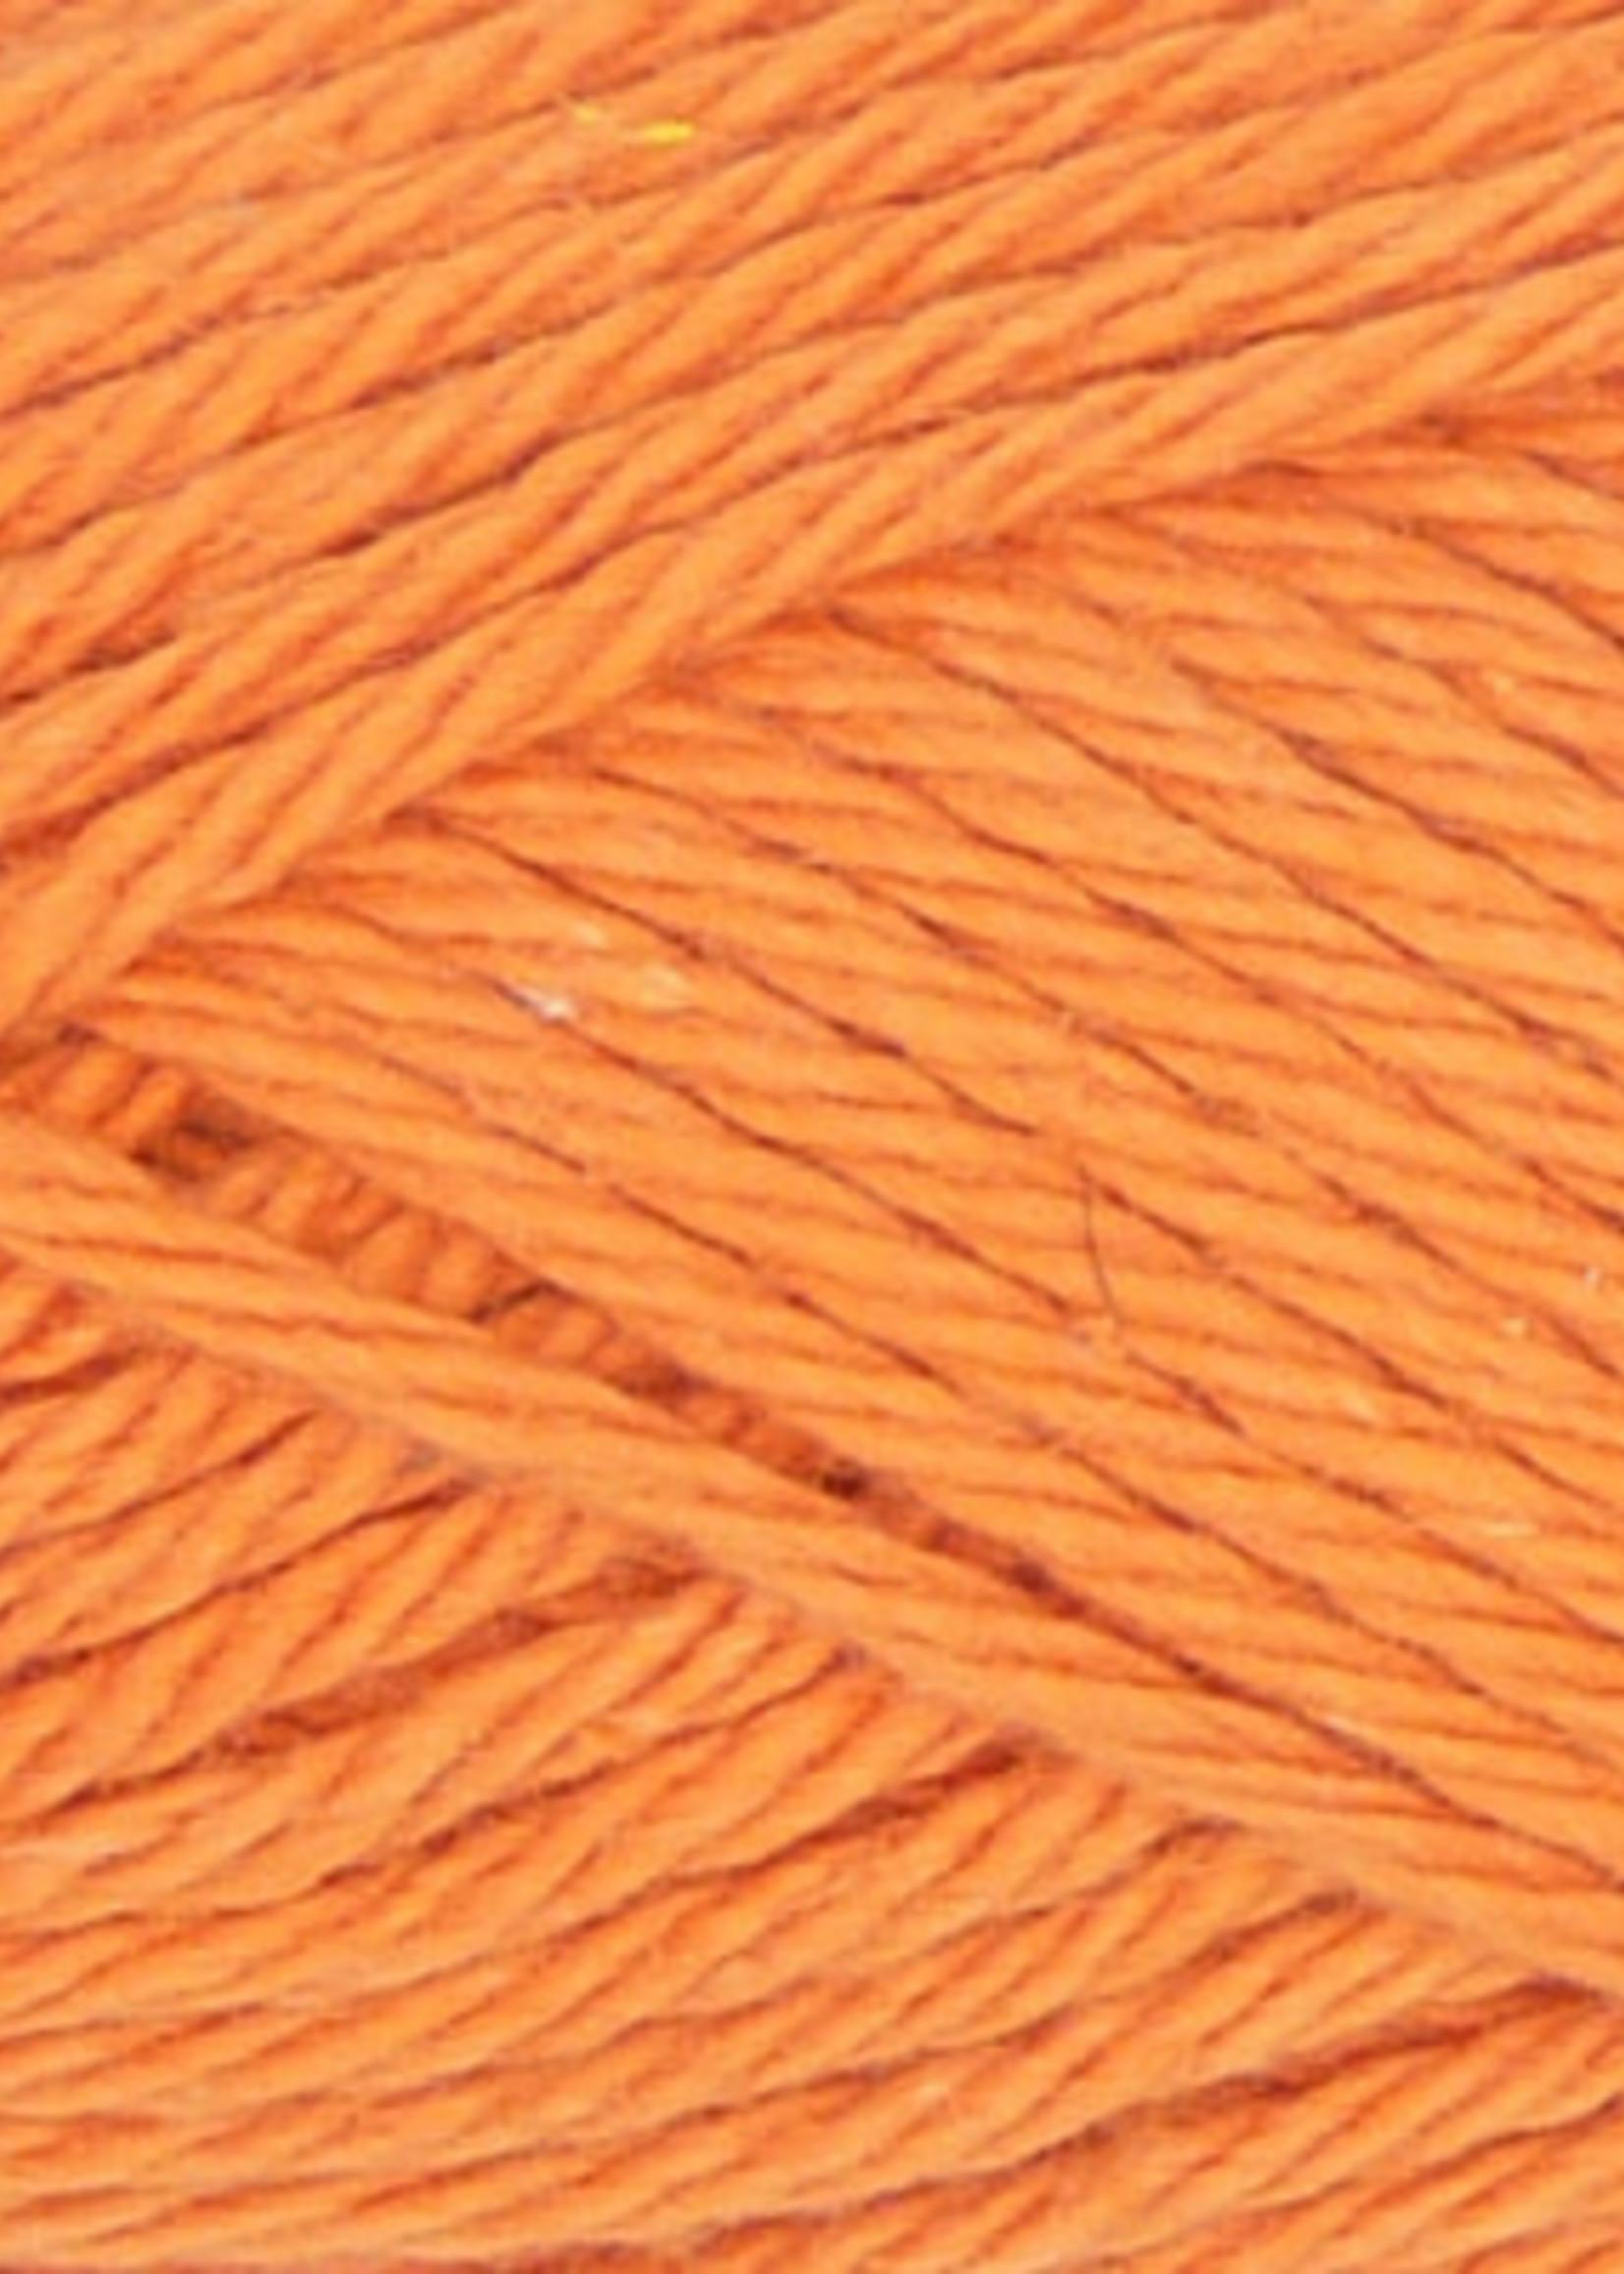 Estelle Yarns Sudz Cotton #53925 Carrot